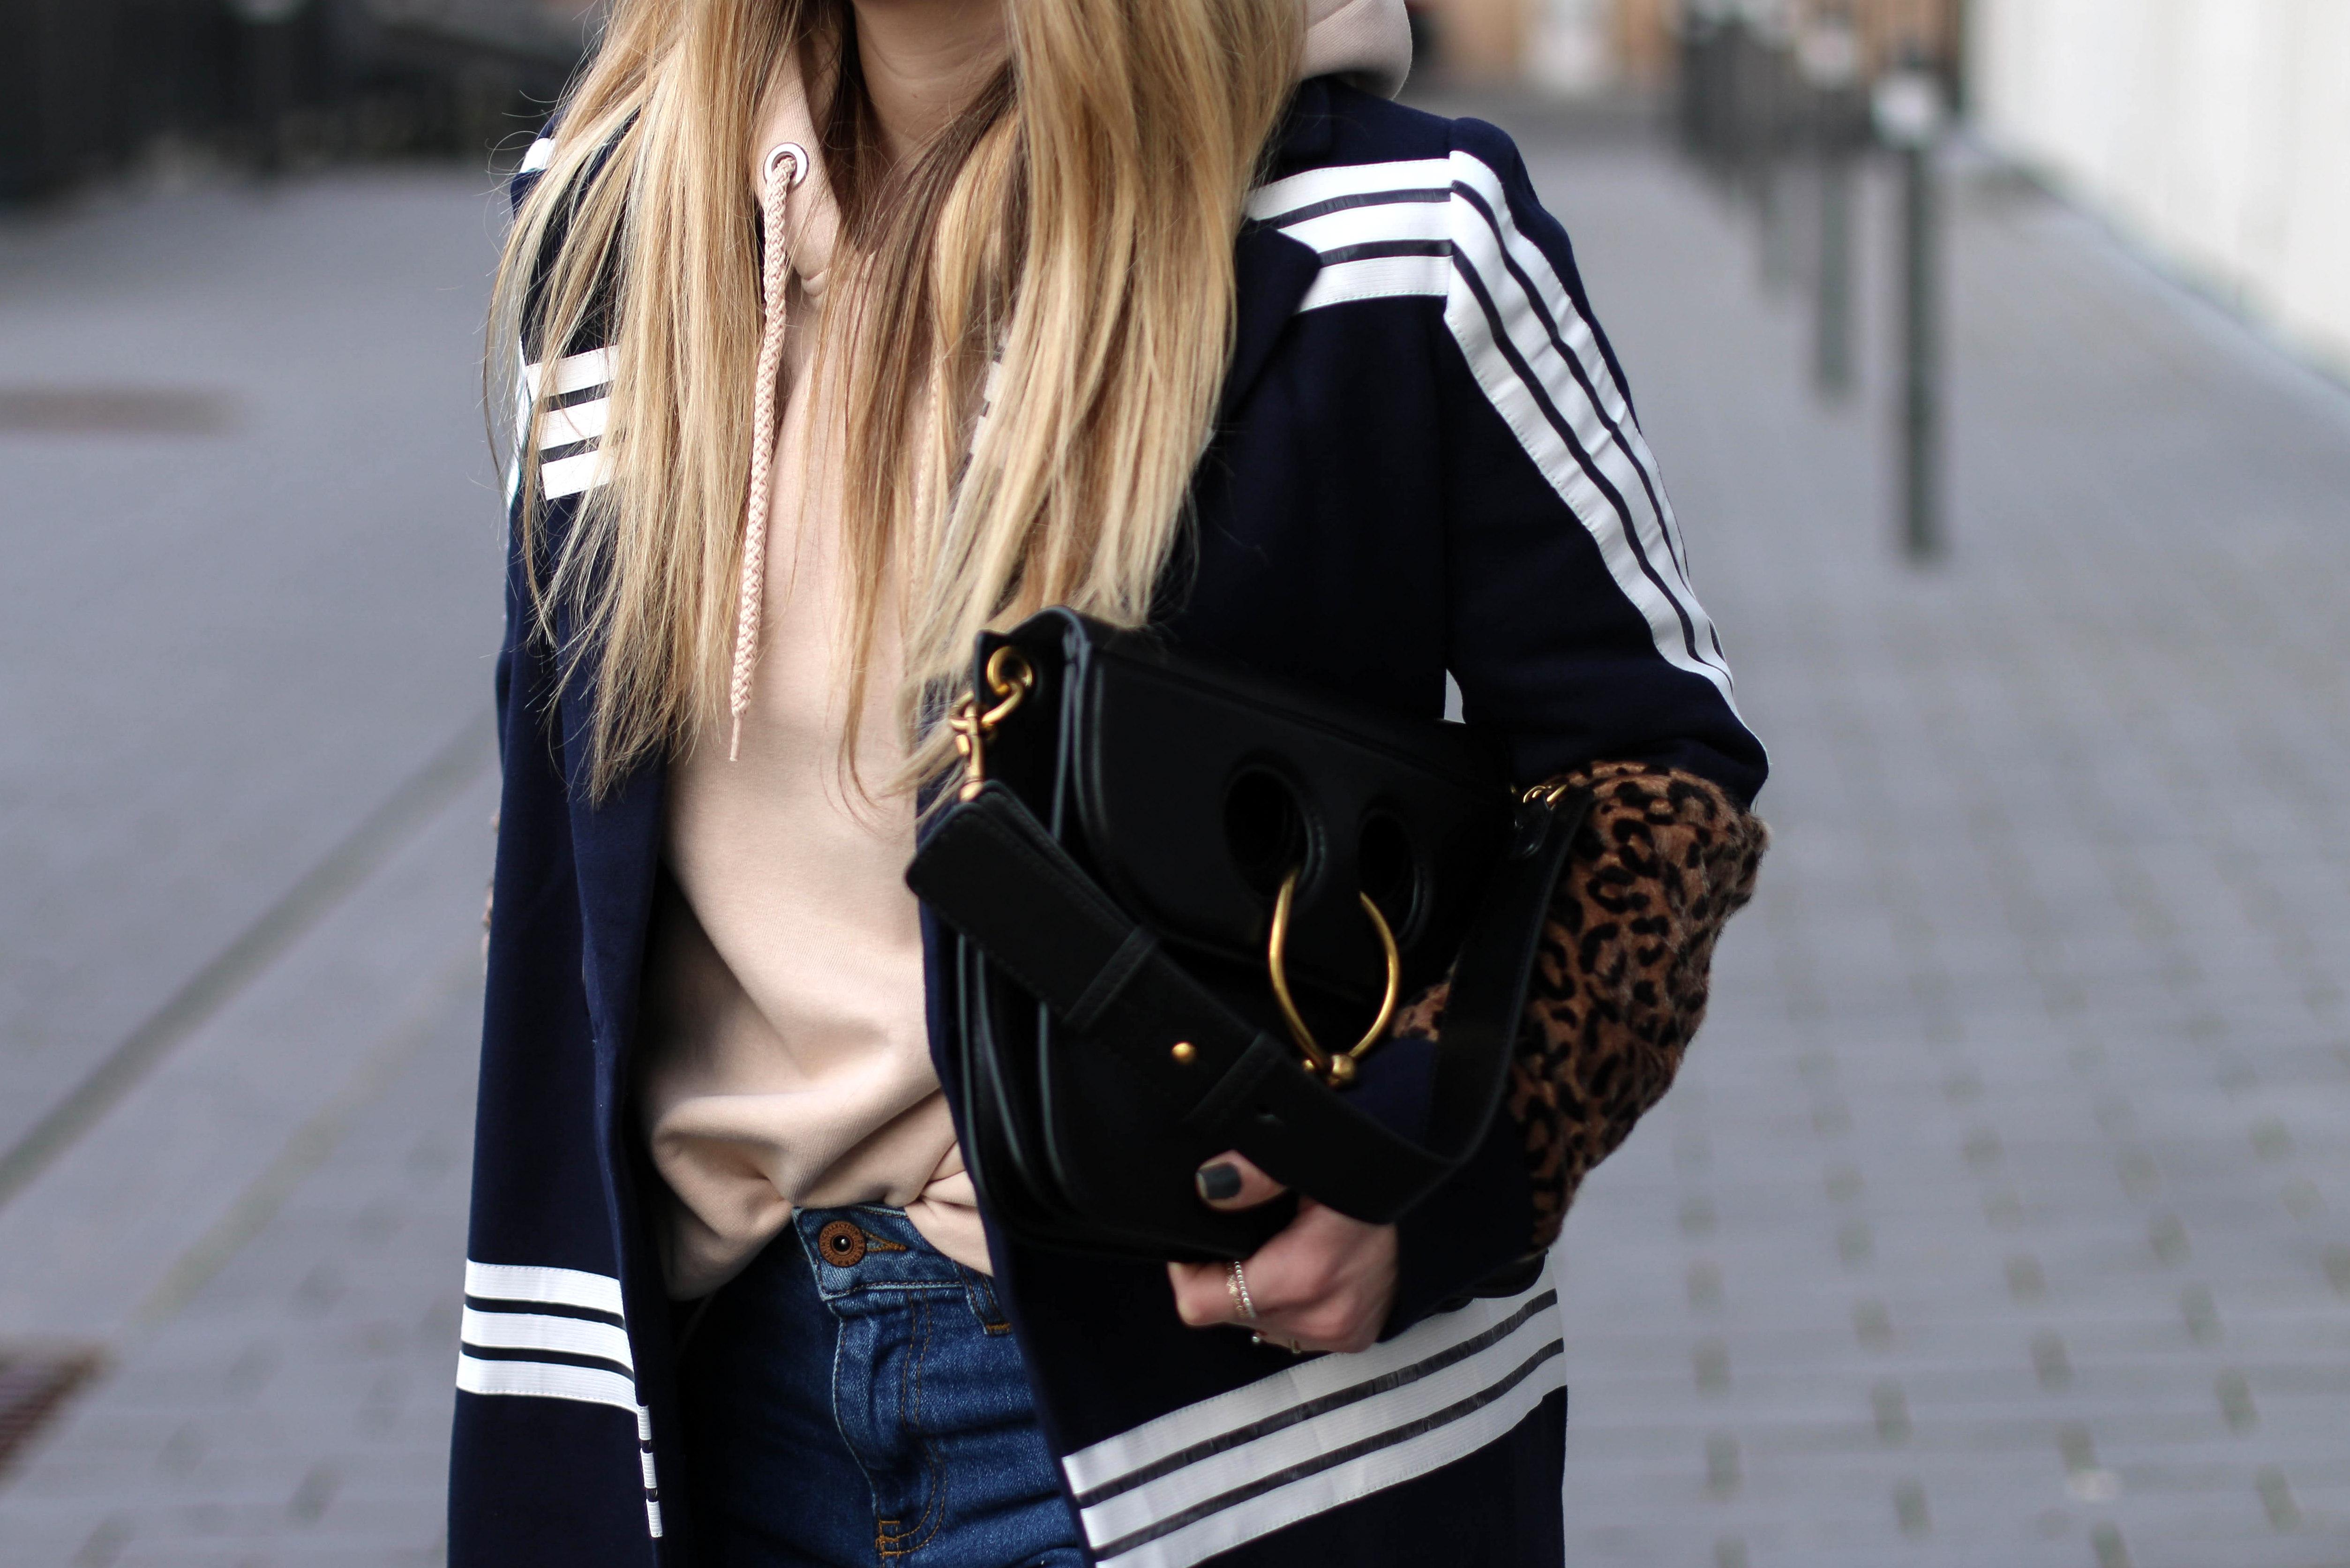 Maxi Coat Streetstyle Pink Hoodie JW Anderson Bag